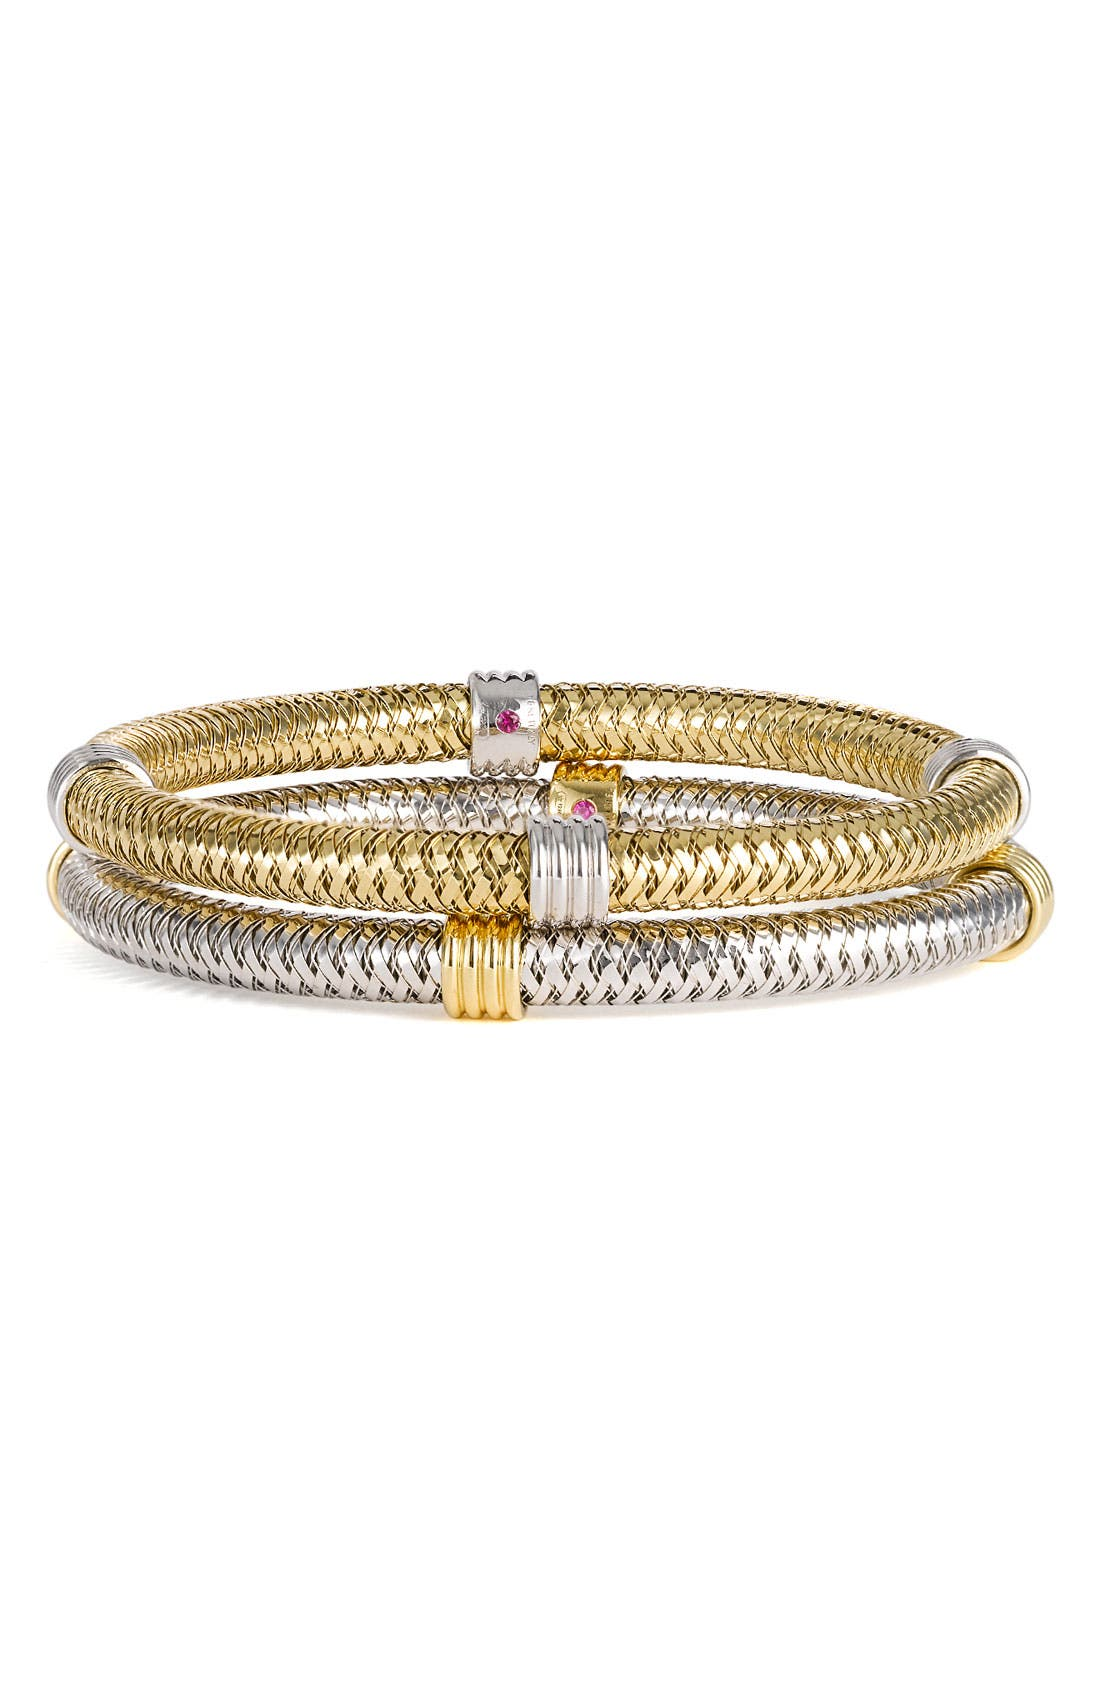 Main Image - Roberto Coin 'Primavera' Gold Stackable Bracelet